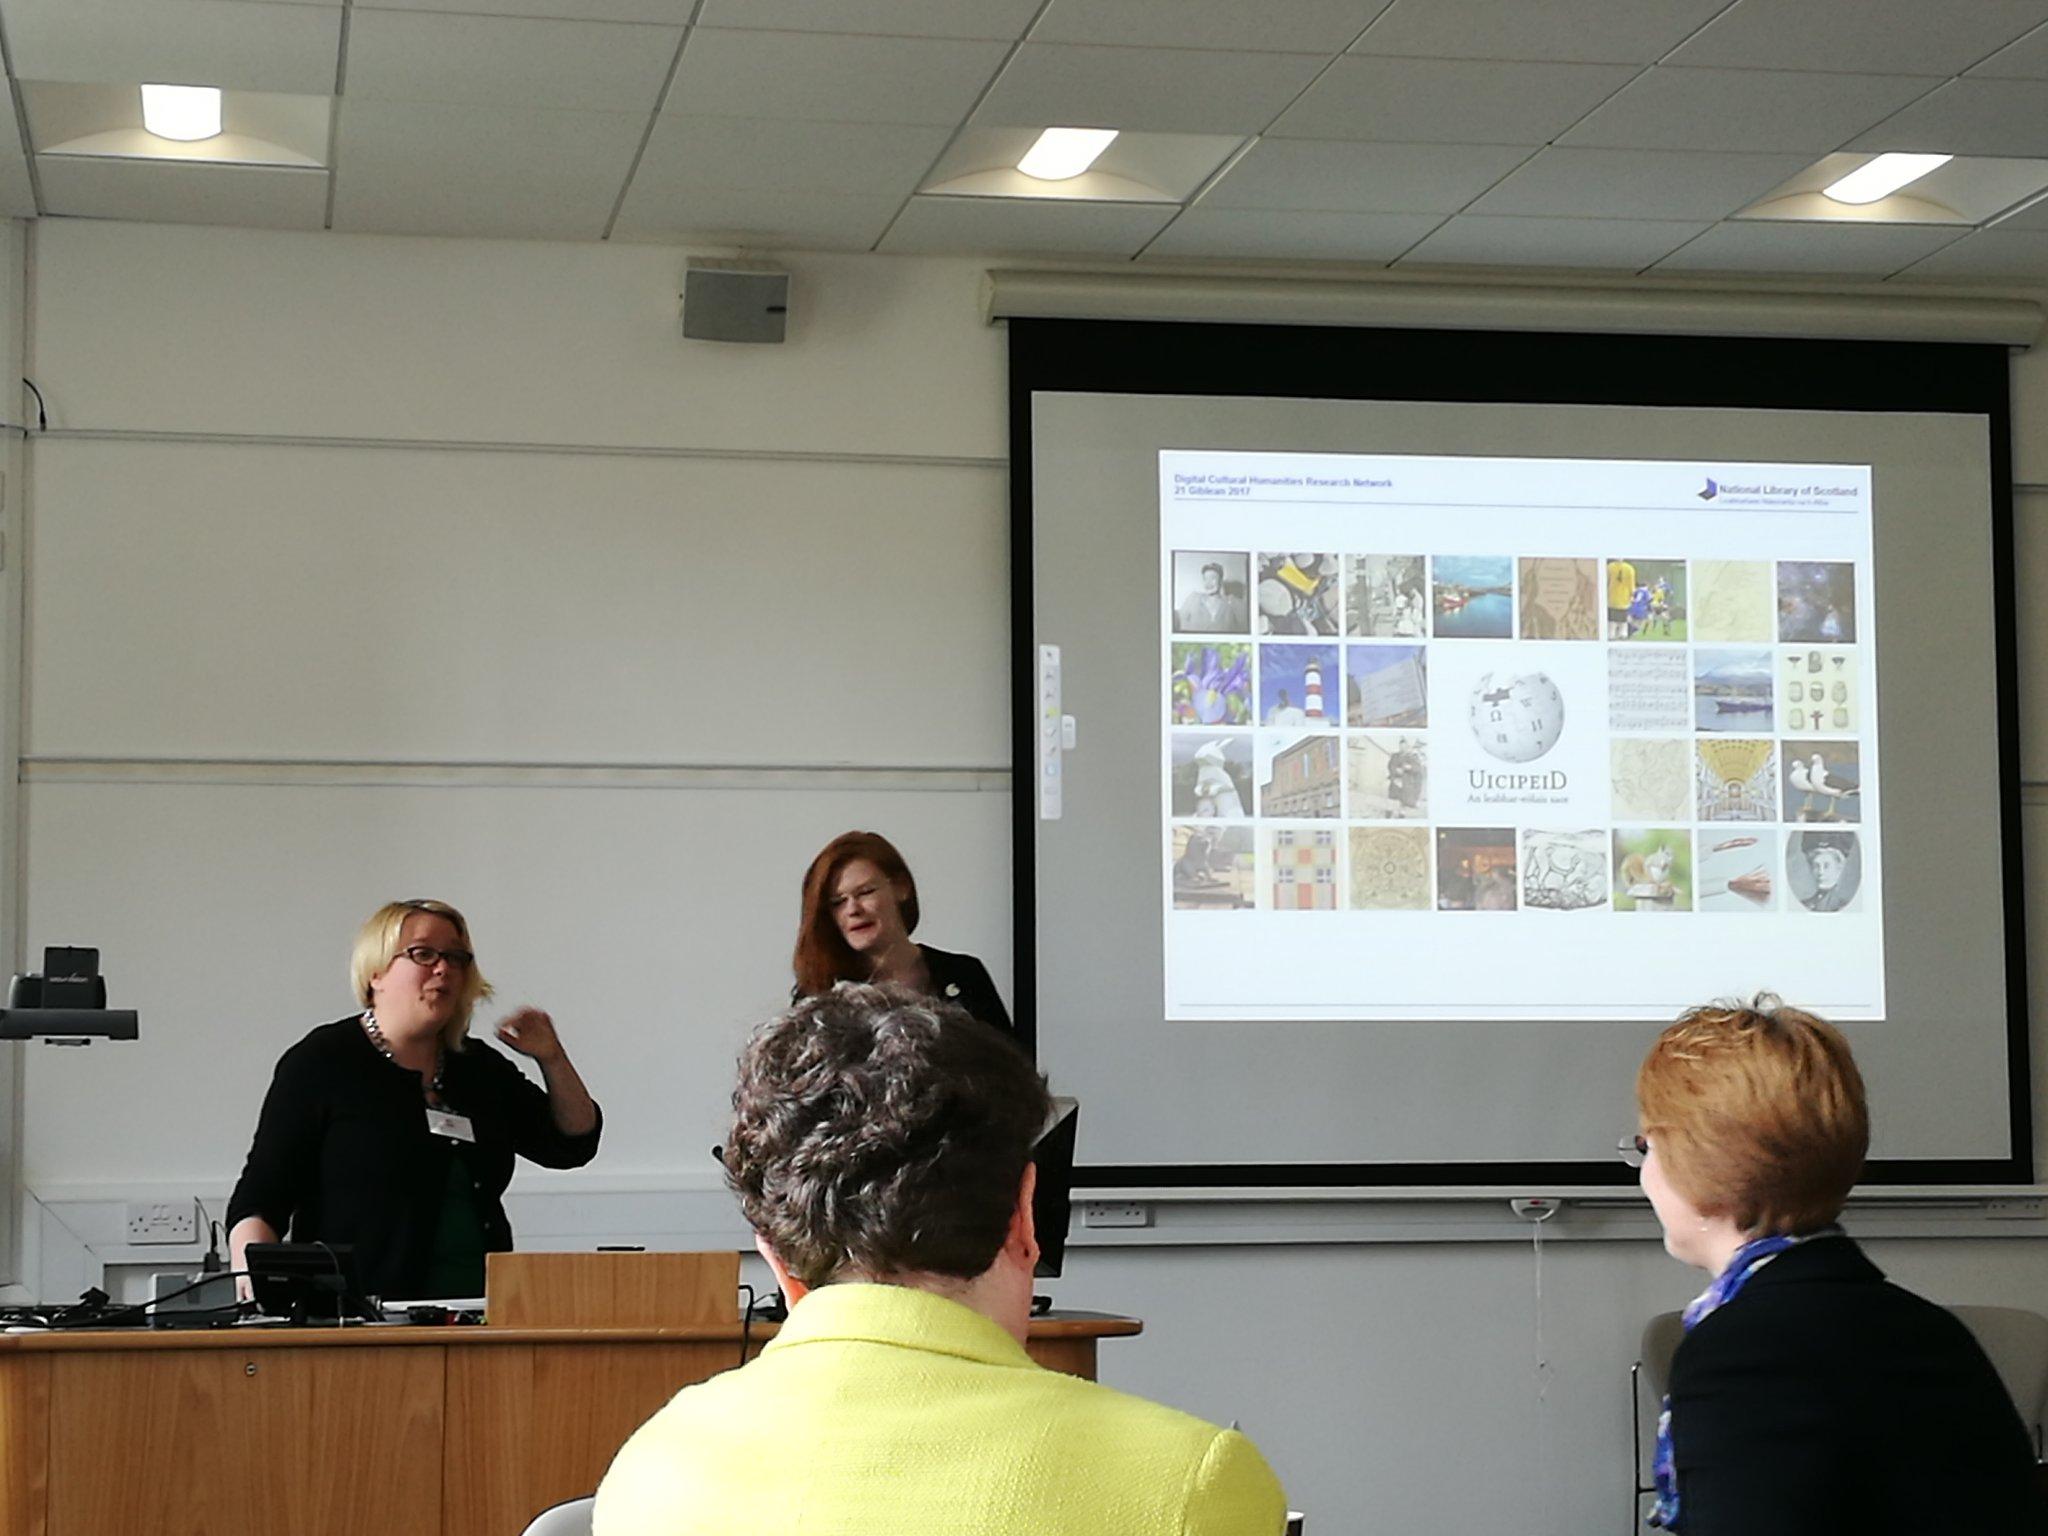 Susan Ross on Scottish Gaelic wikipedia being introduced by Jen Ross. #dchrn https://t.co/jVLQORjg5Y